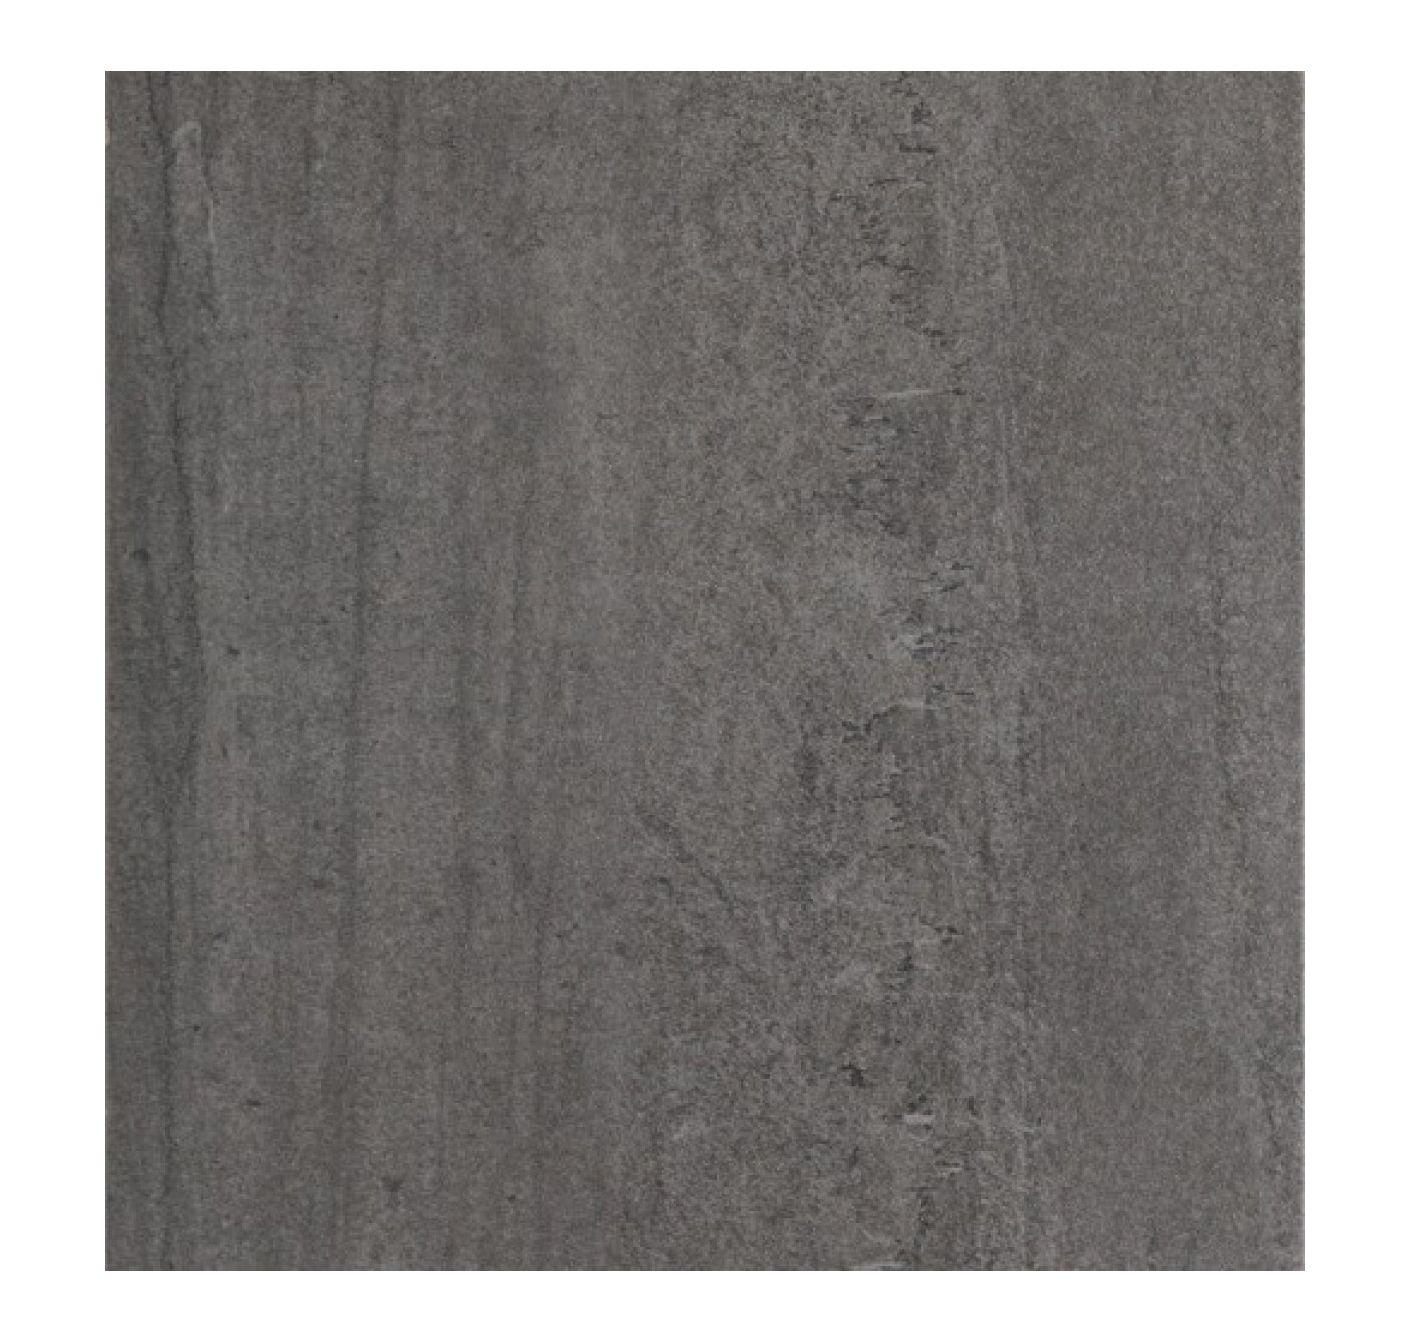 Antraciet Tegels 60x60.Keramische Tuintegel 60 X 60 Cm Quarzite Antraciet Dikte 4 Cm Per Tegel